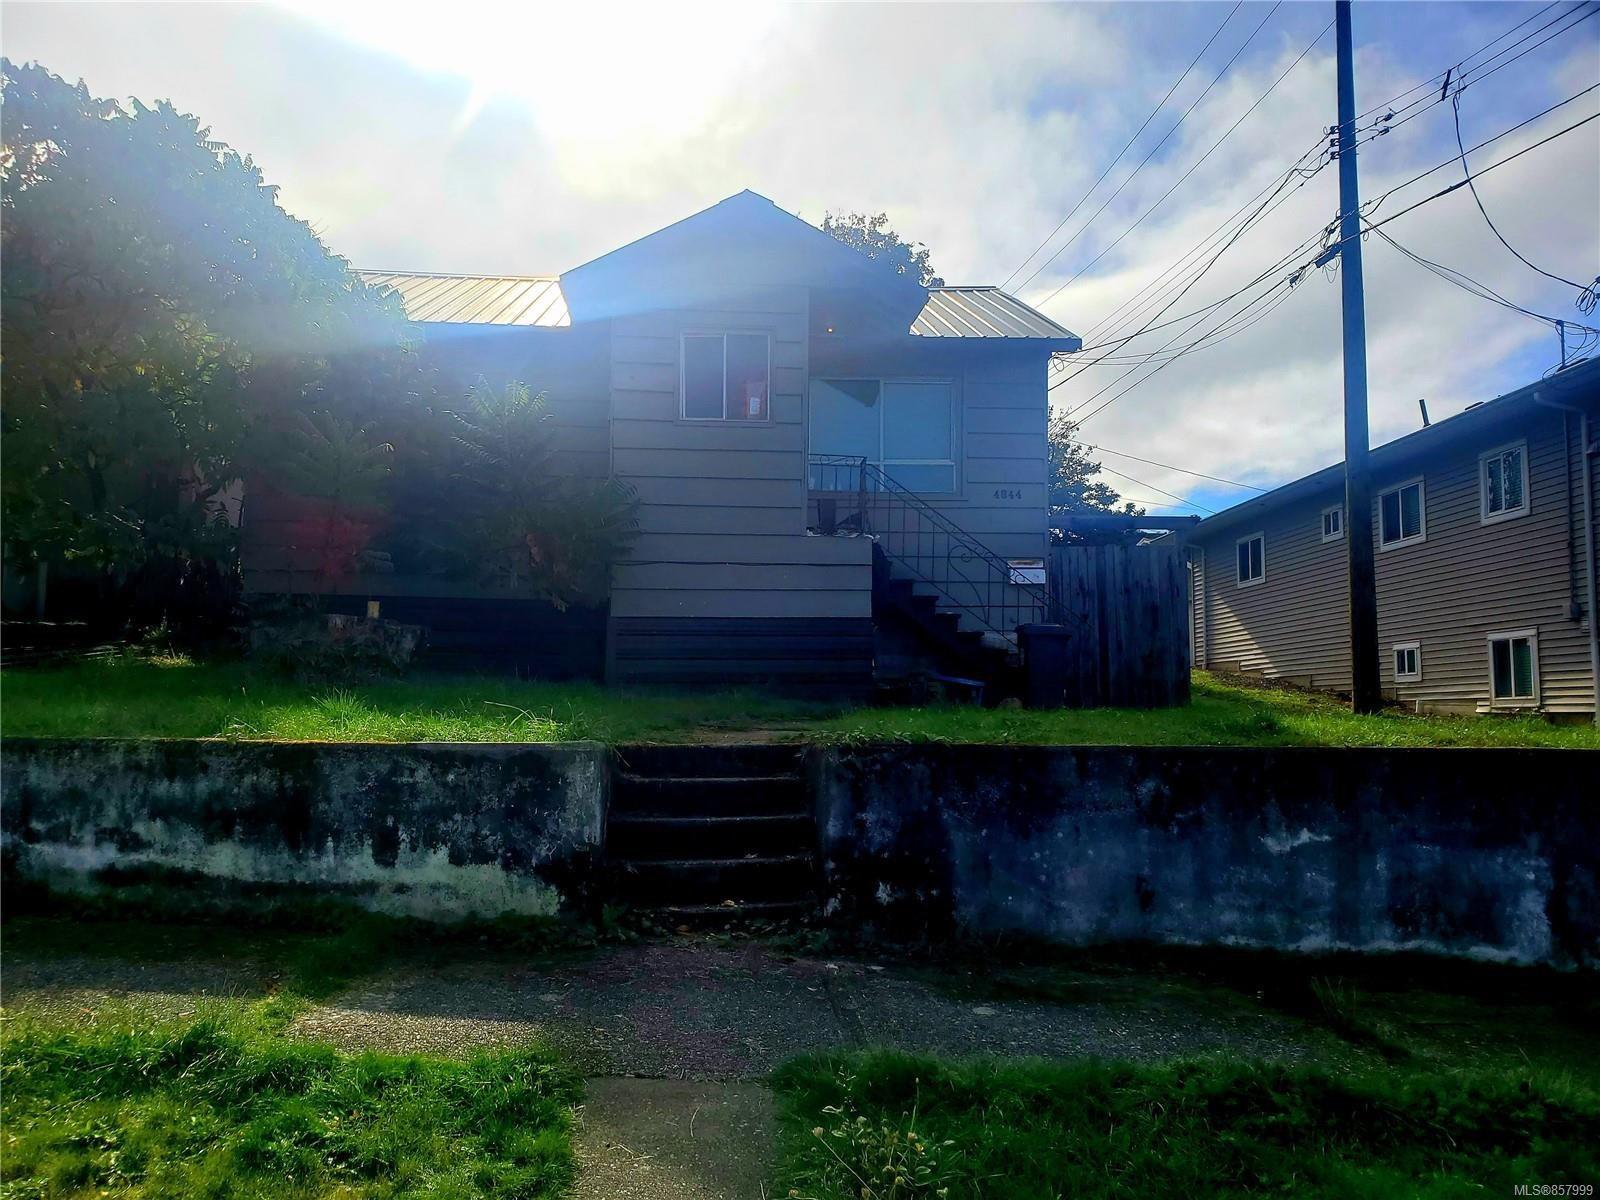 Main Photo: 4844 Strathern St in : PA Port Alberni House for sale (Port Alberni)  : MLS®# 857999